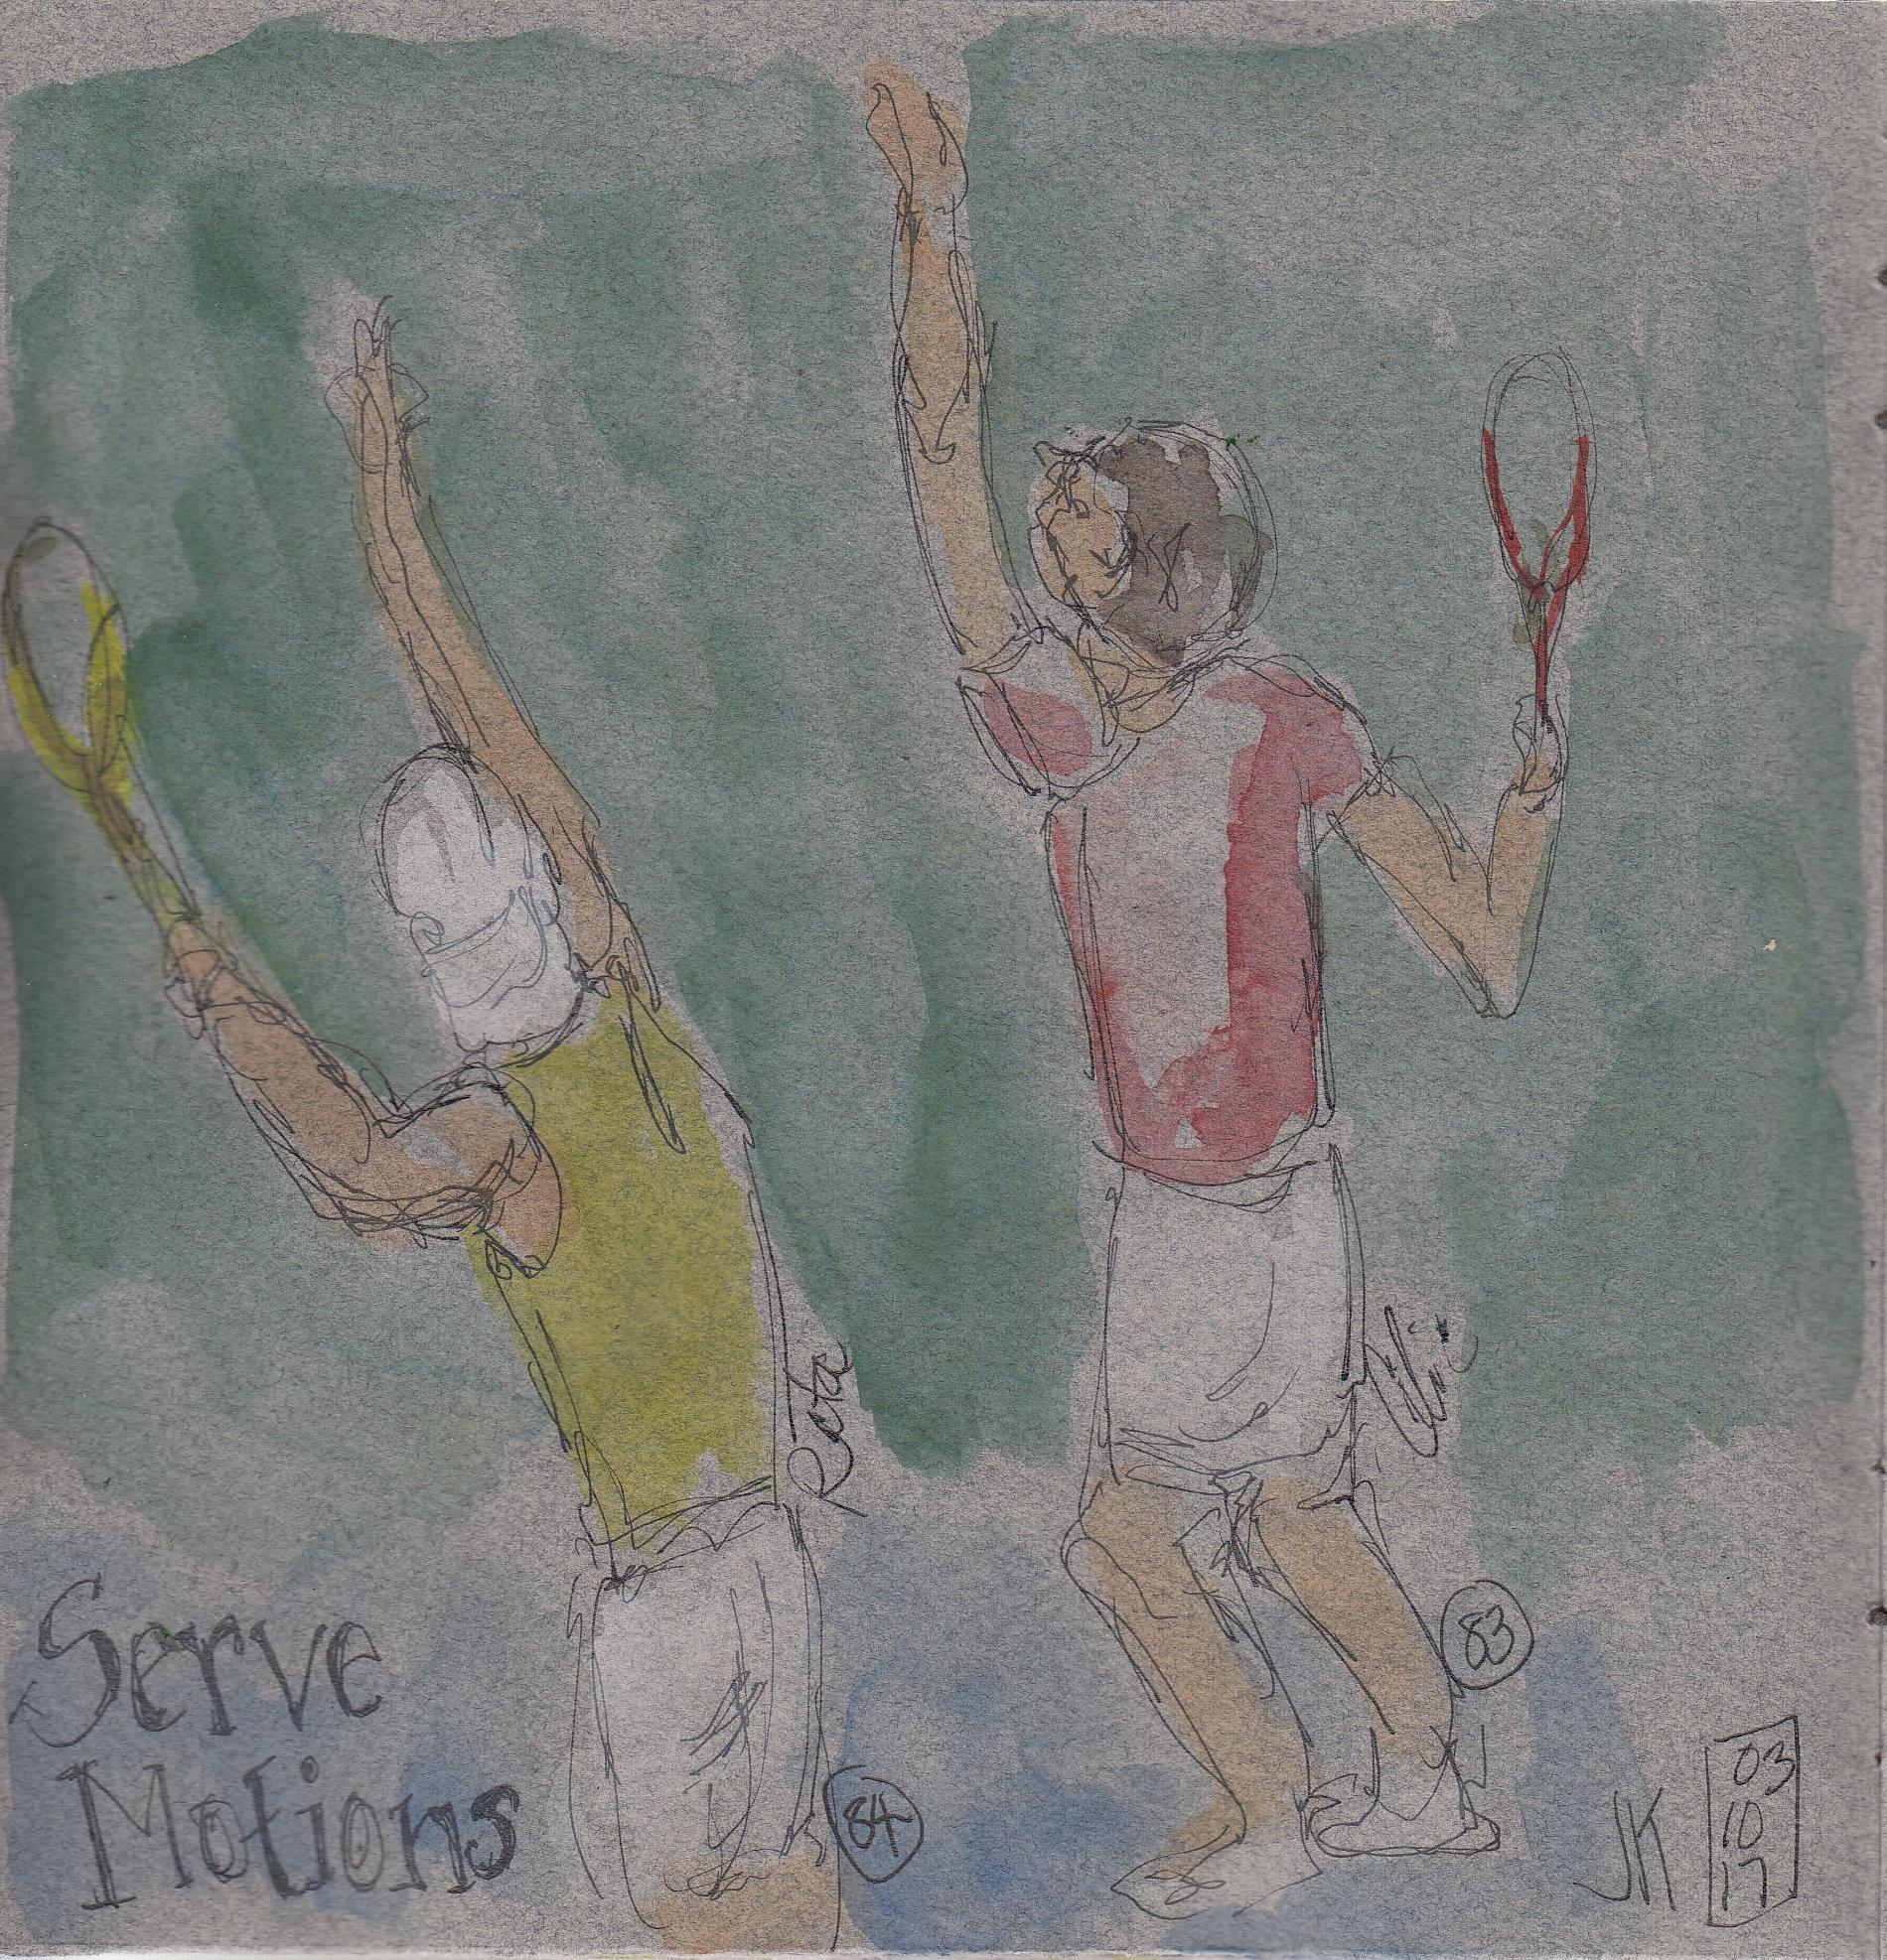 Nos. 83 & 84 - Rafa Nadal and Marin Cilic practicing their serves